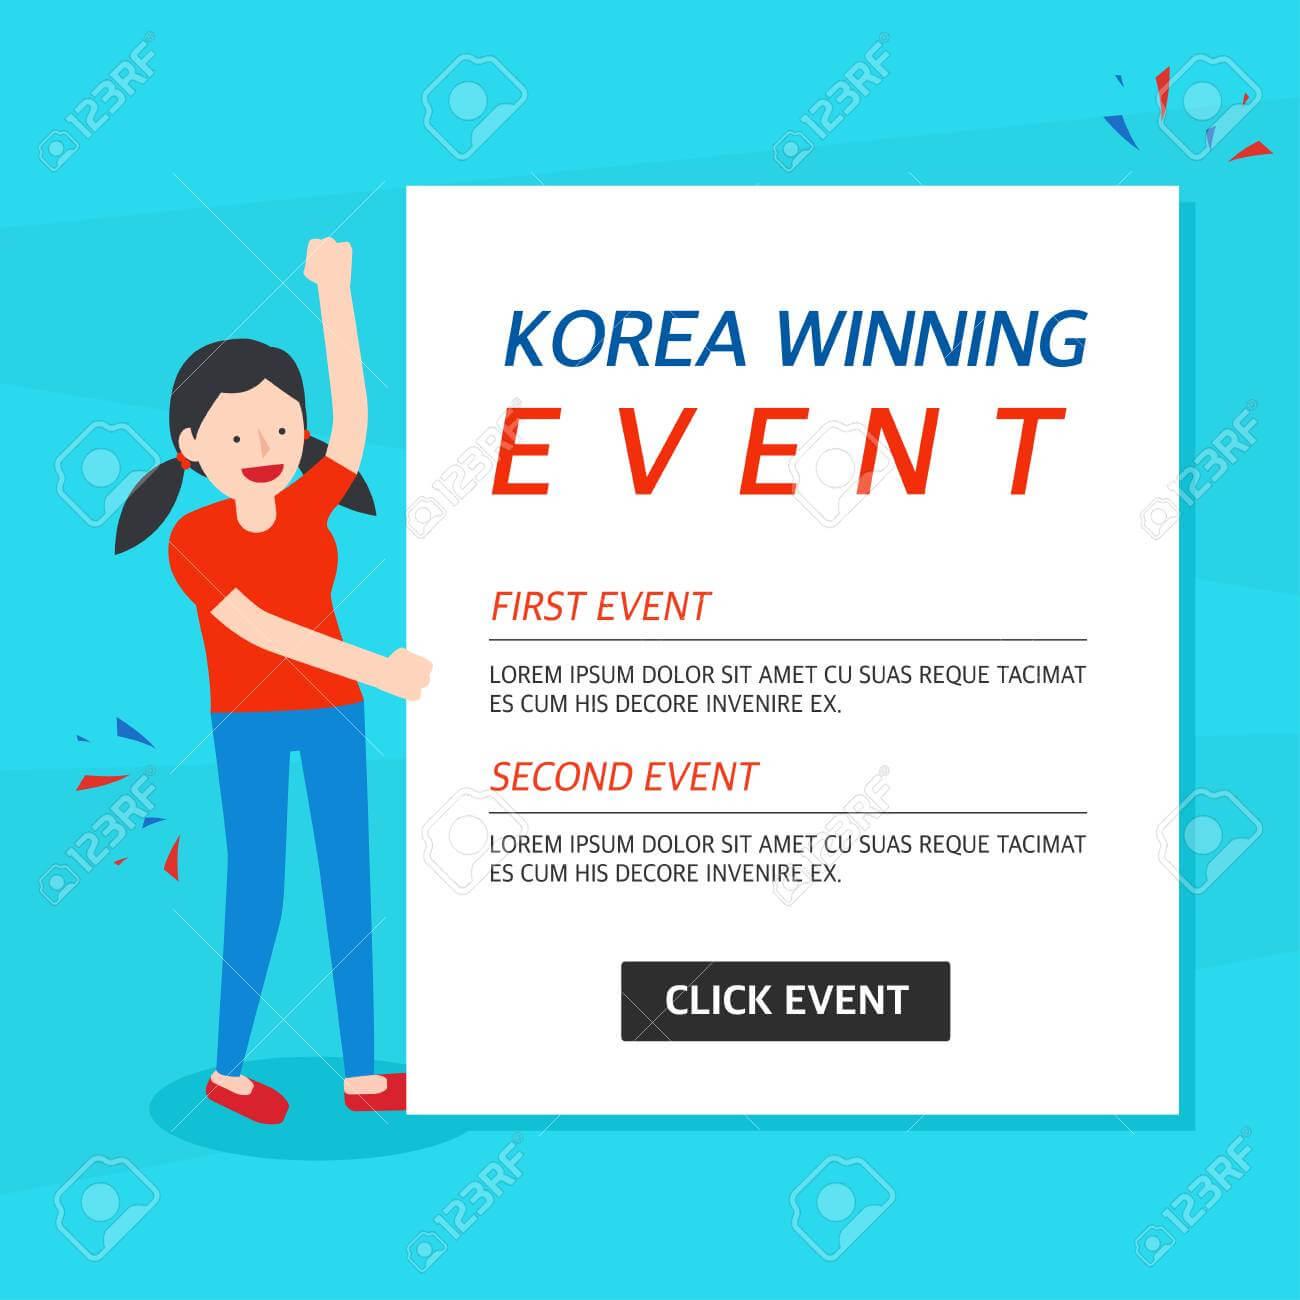 Korea Winning Event Banner Template Pertaining To Event Banner Template